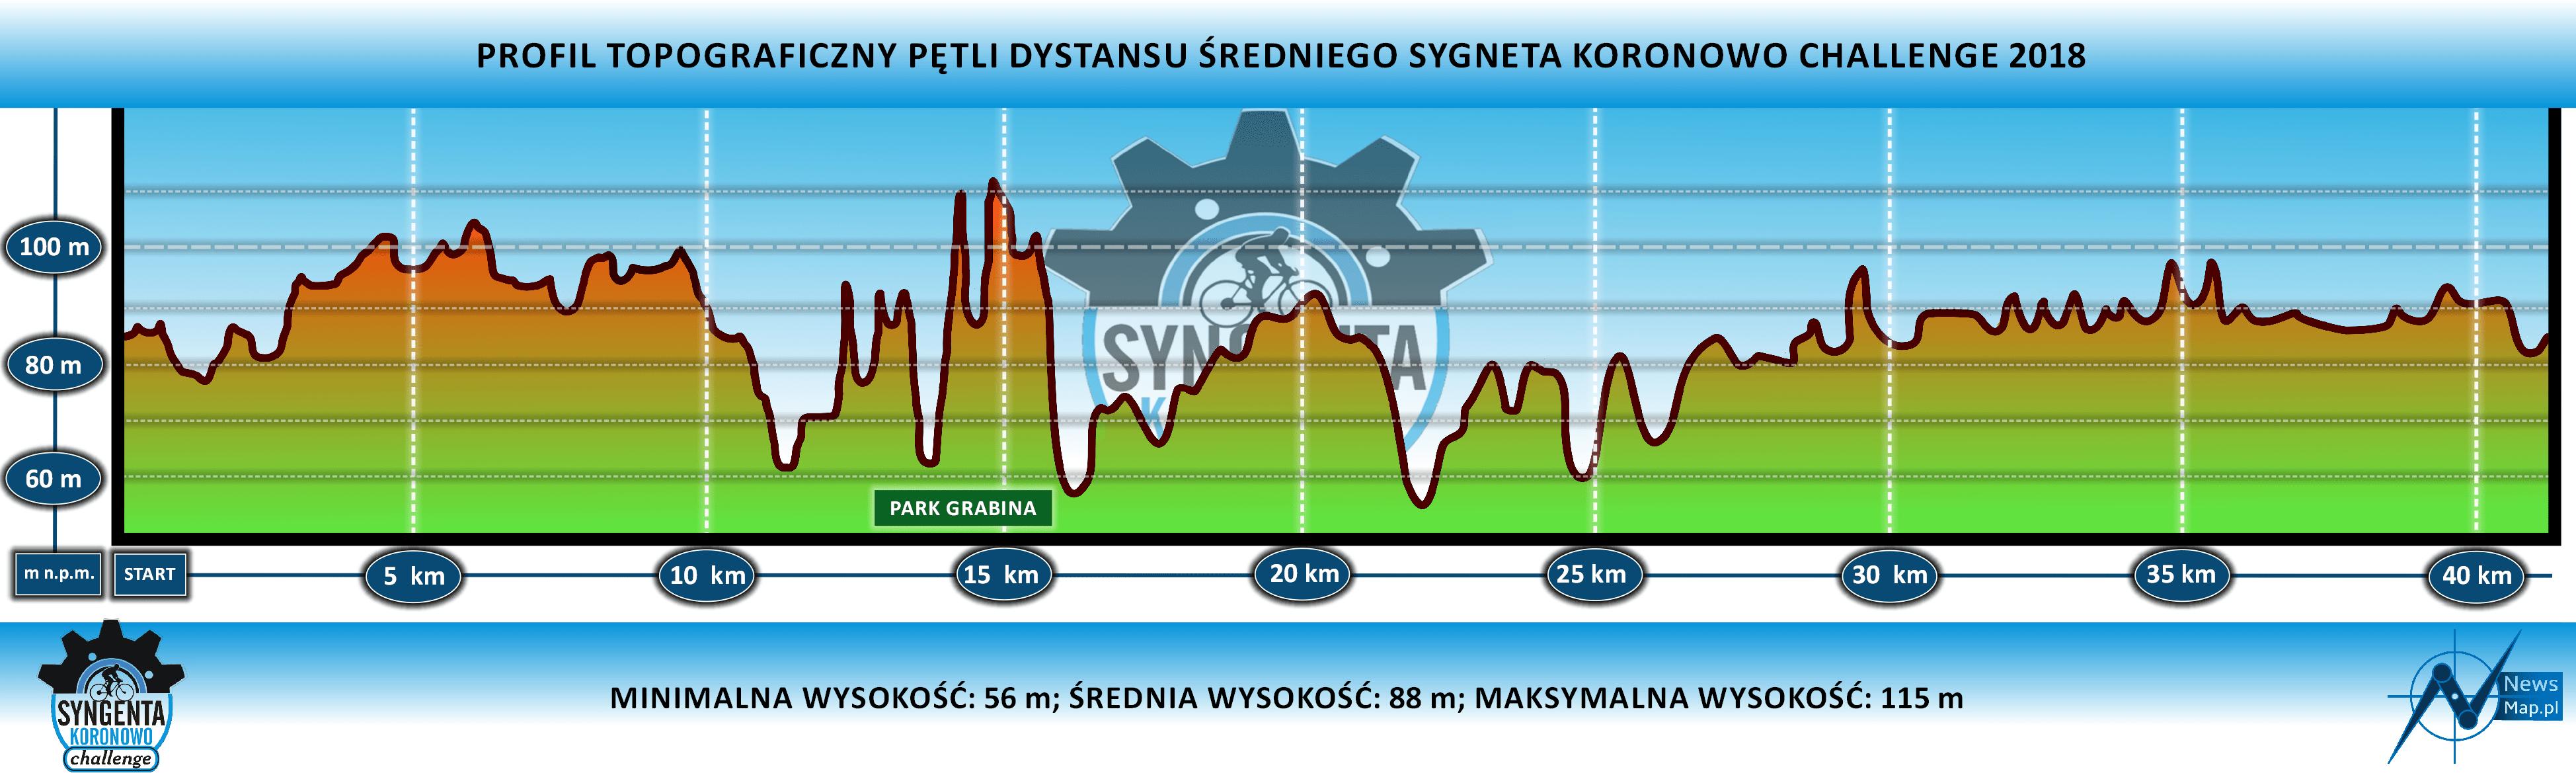 SKC 2018 - profil trasa średnia